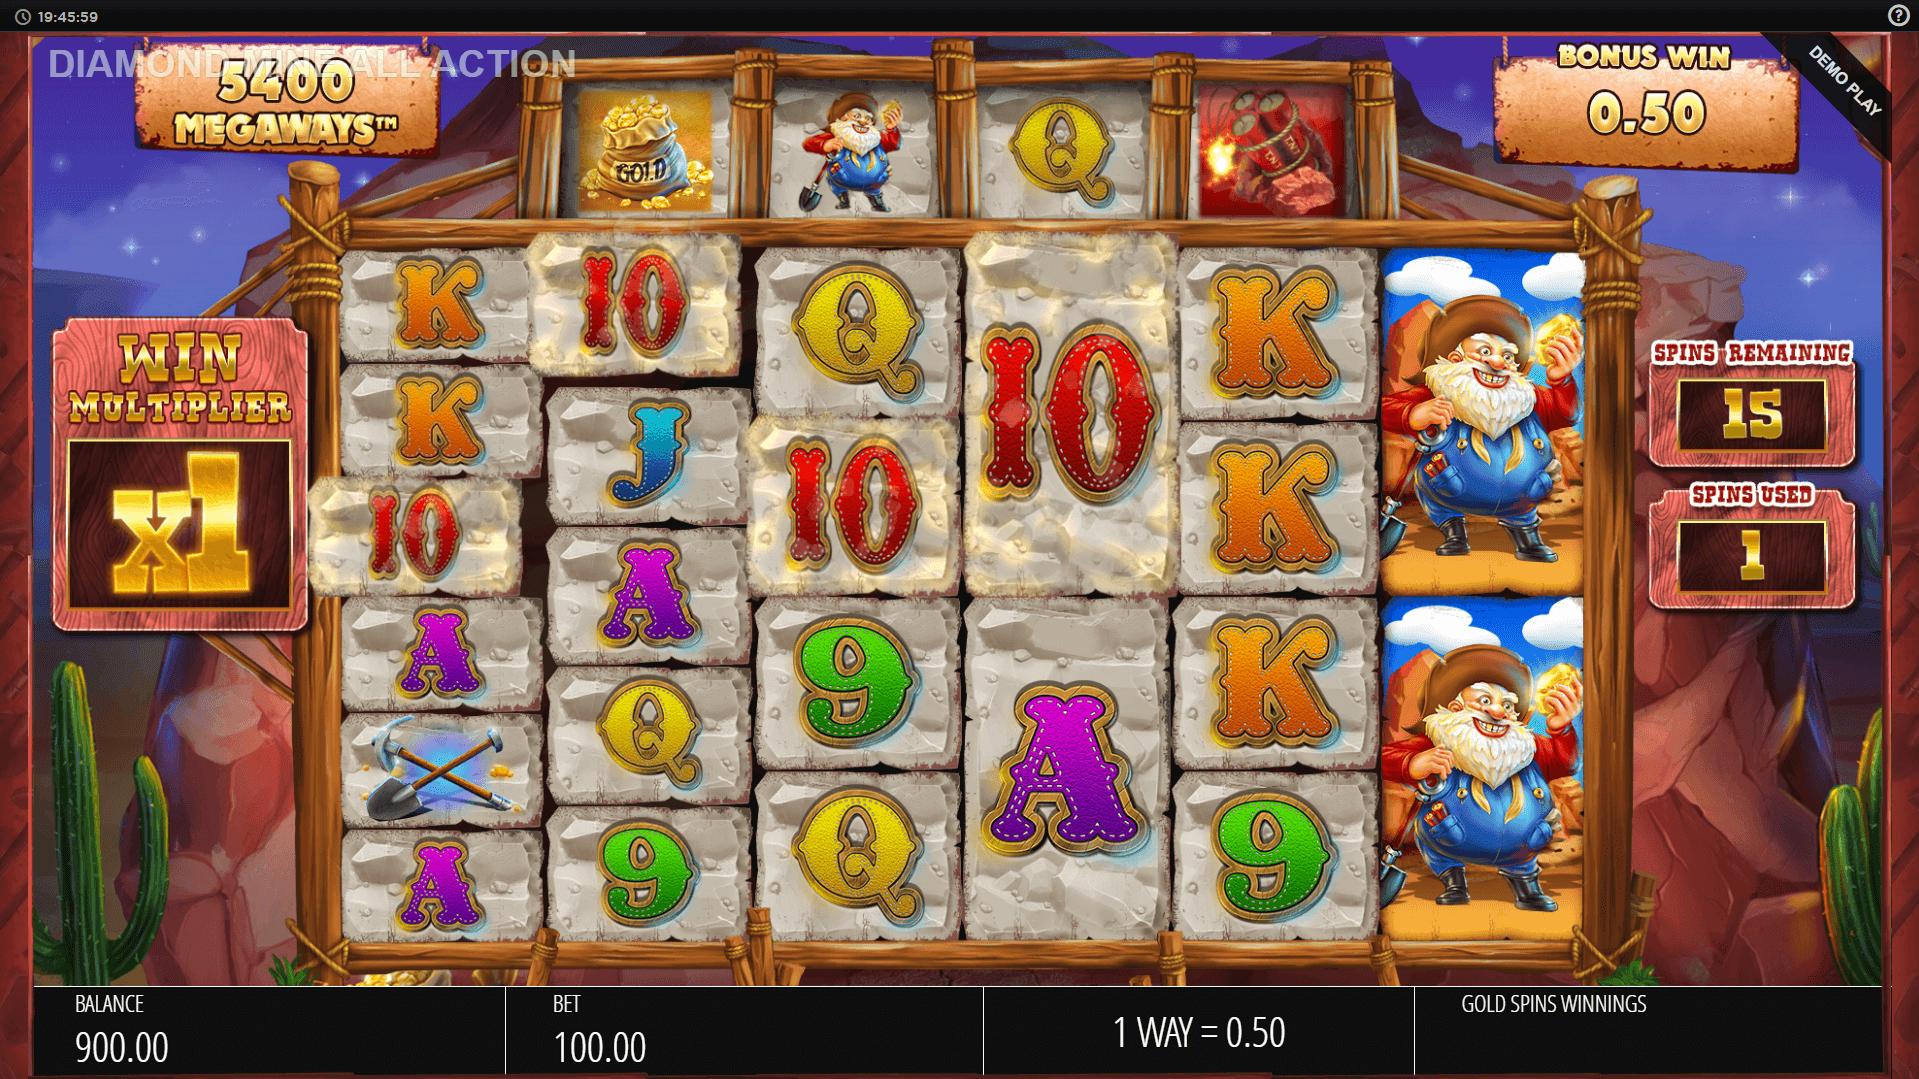 Diamond Mine Megaways All Action slot machine screenshot